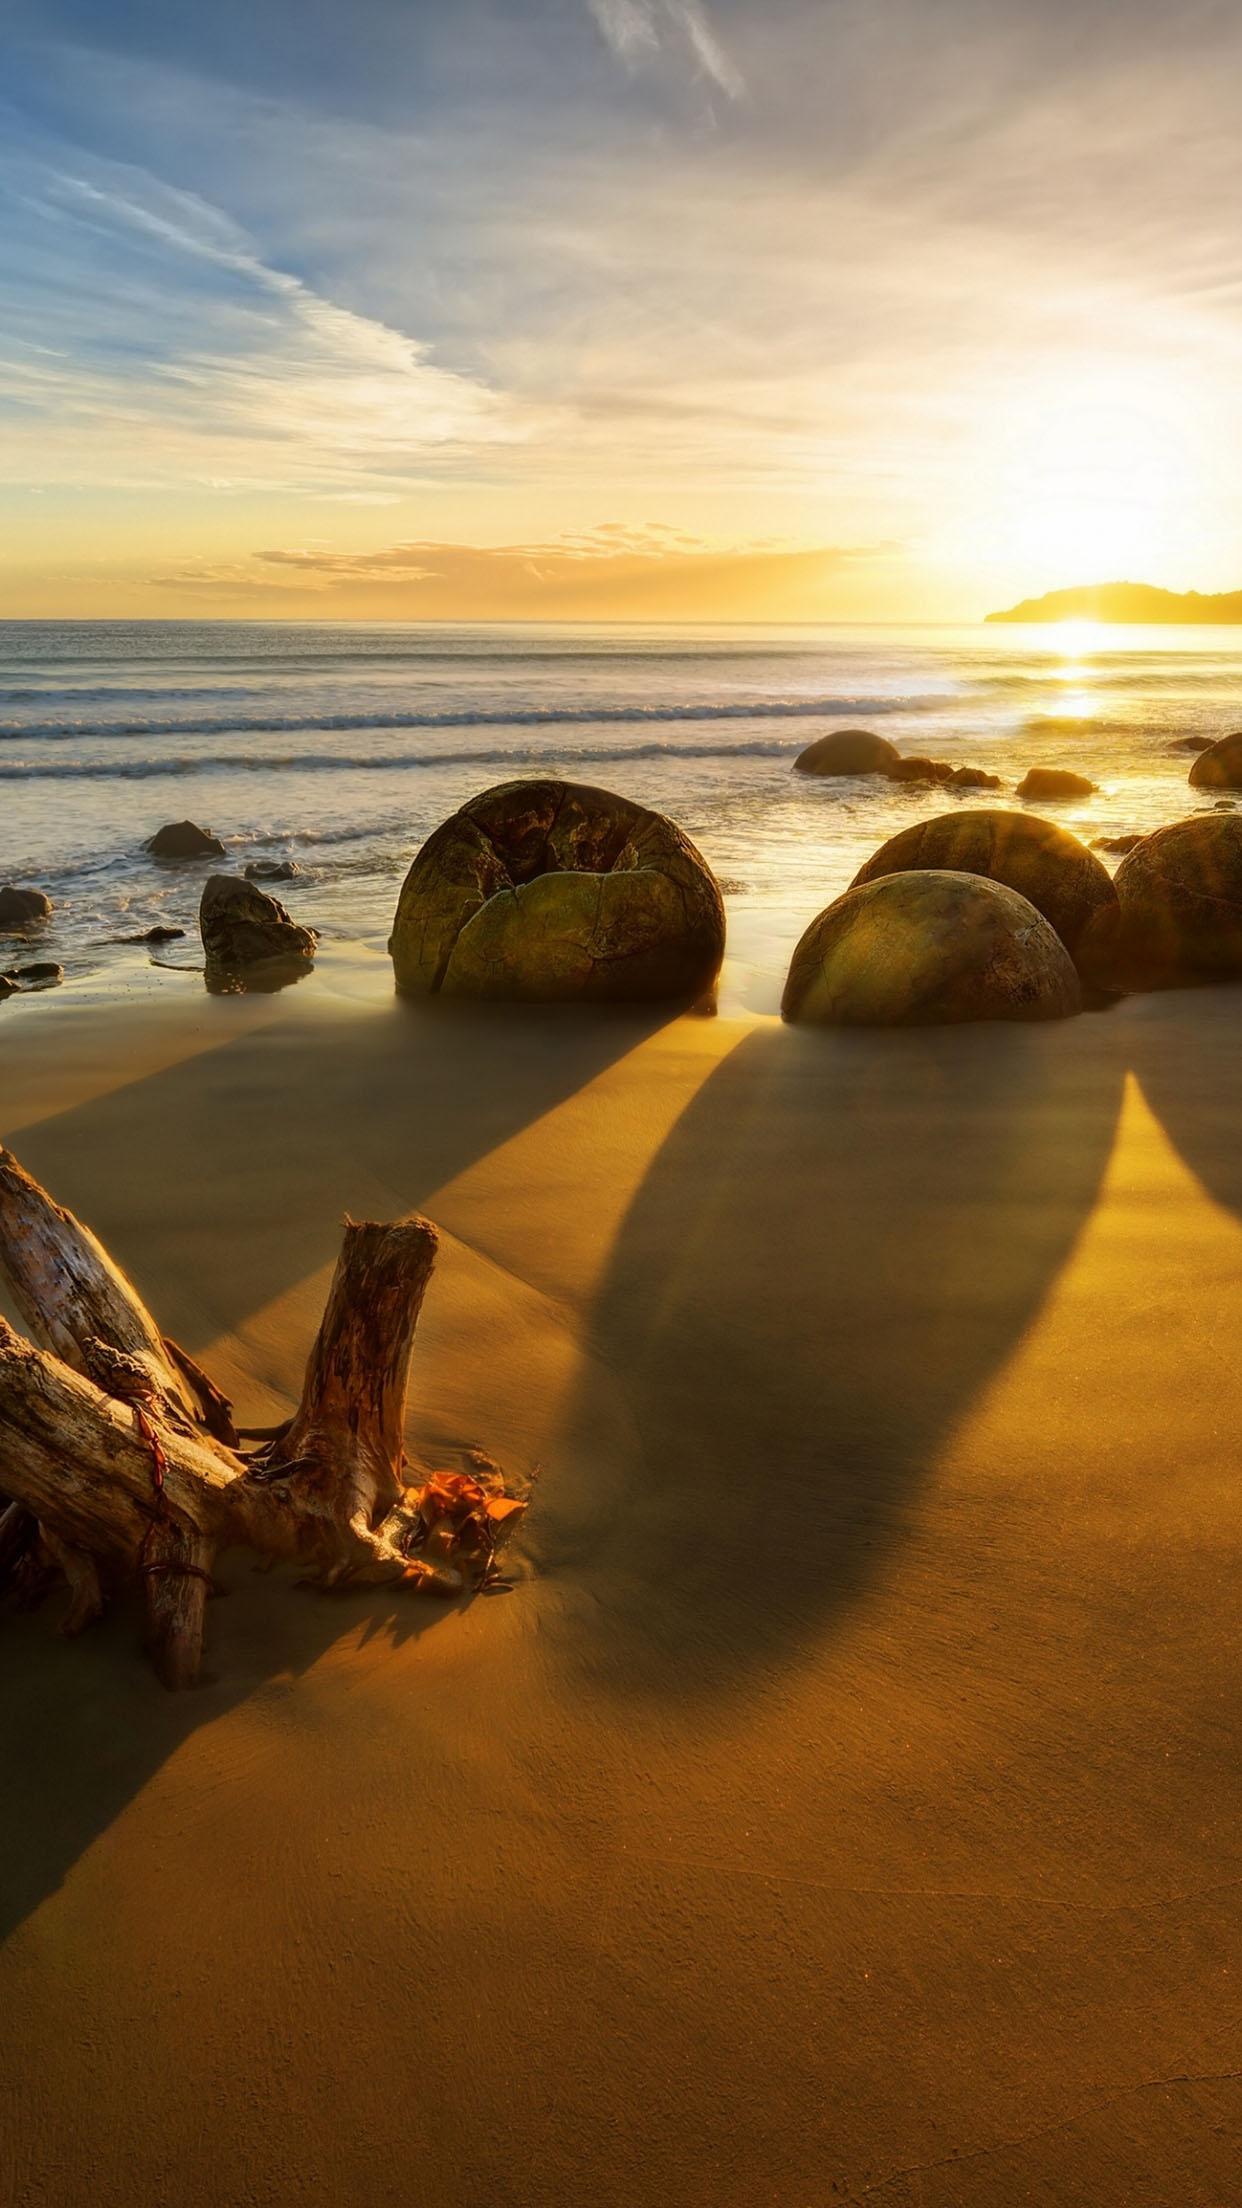 New Zealand Sunrise 3Wallpapers iPhone Parallax New Zealand: Sunrise